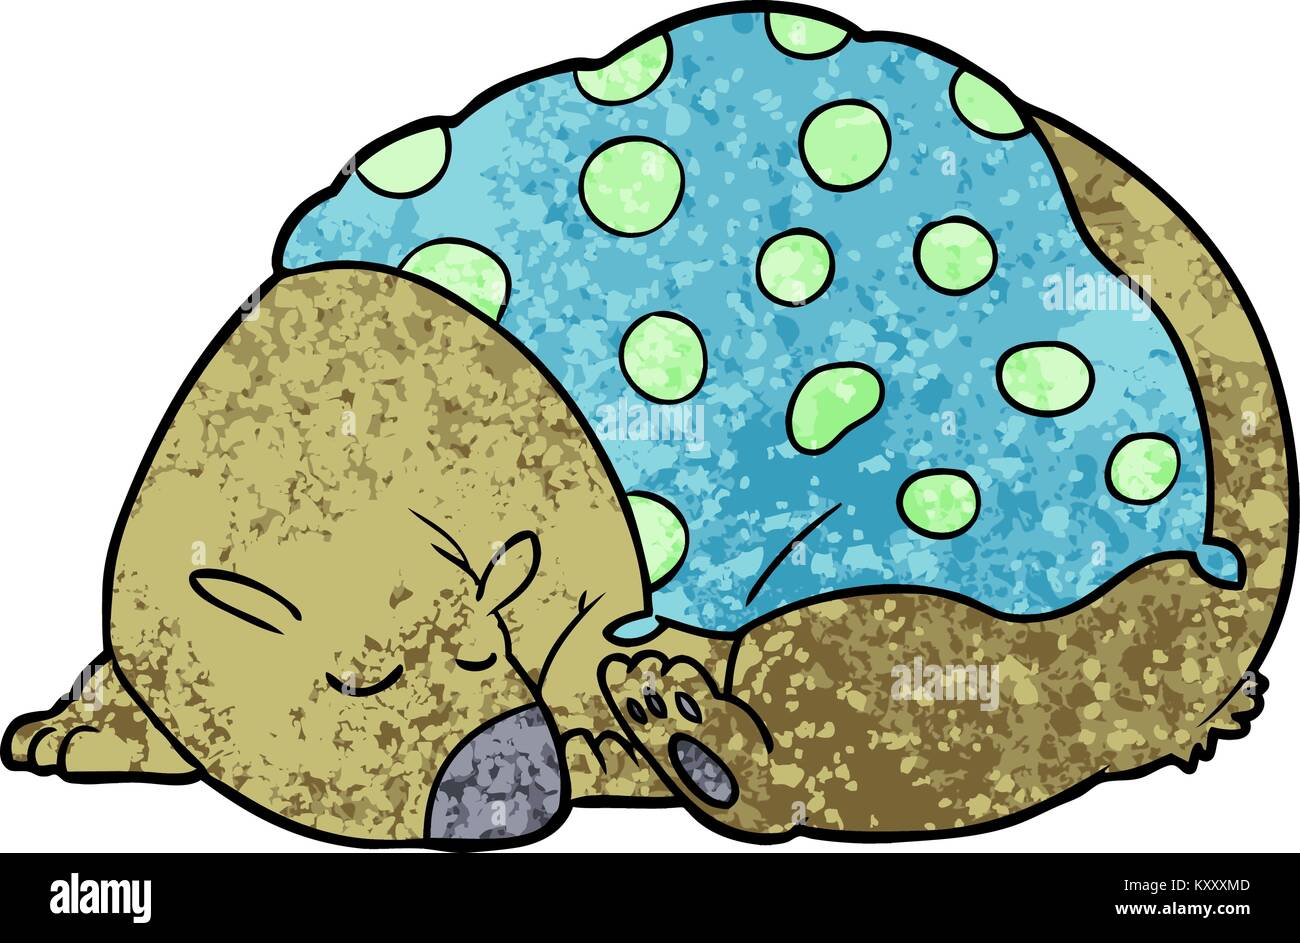 sleeping bear cartoon character - Stock Image